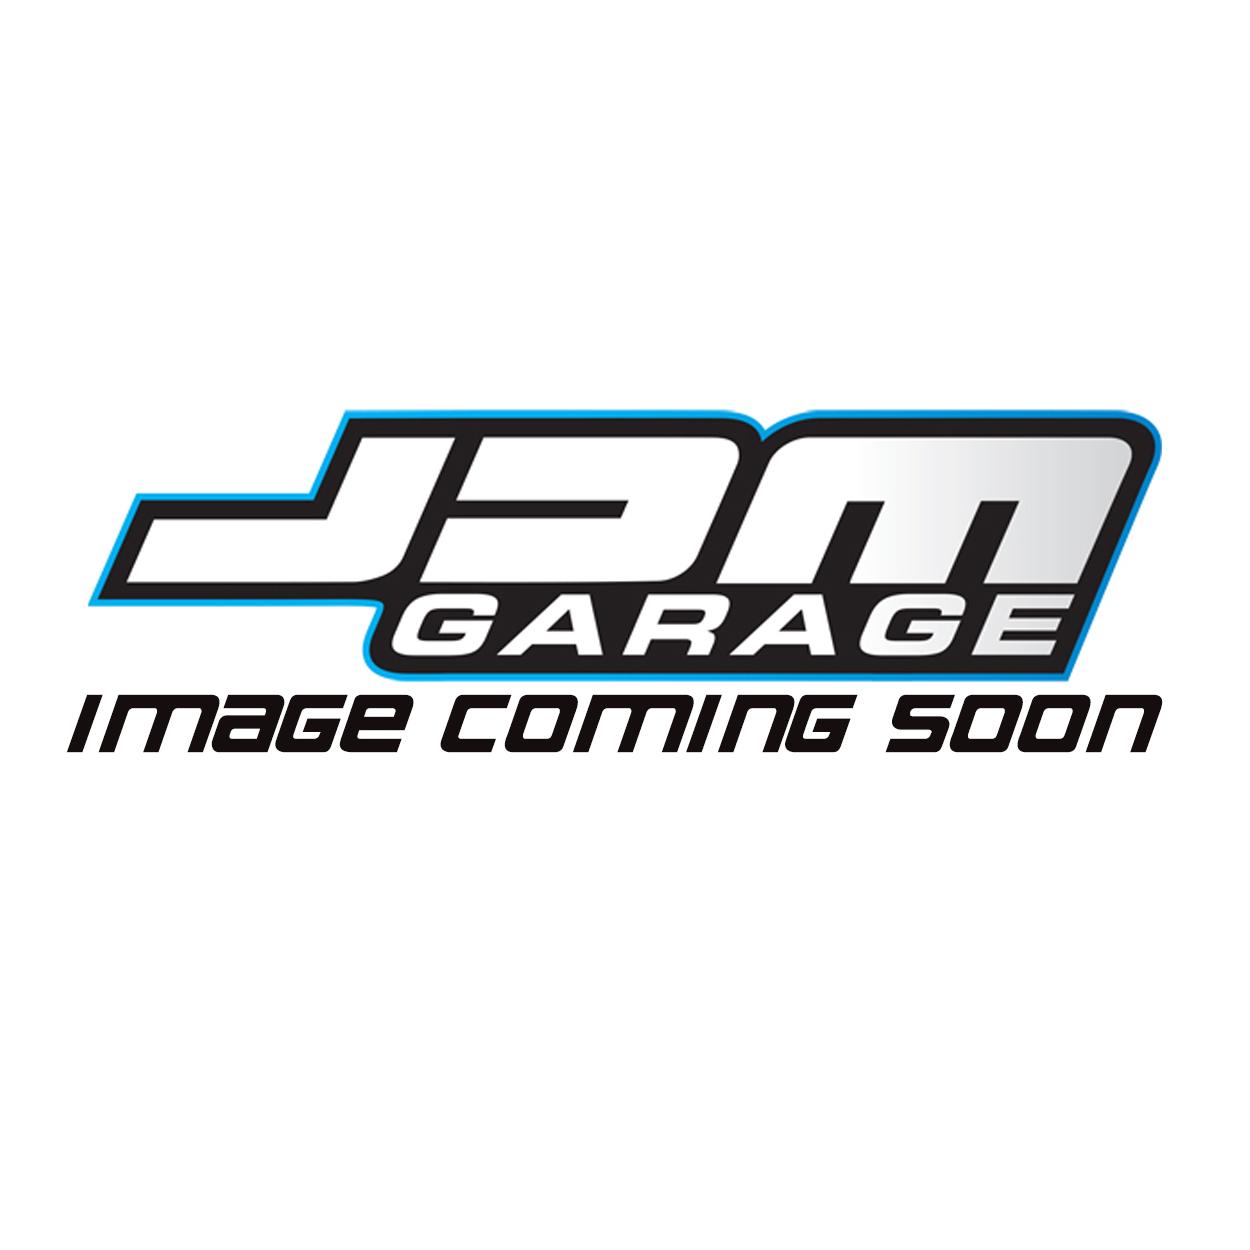 Genuine Nissan Injector Washer Gasket Nozzle Seal Ring Nissan Patrol GU Y61 ZD30 / Navarra D40 16626-54T00